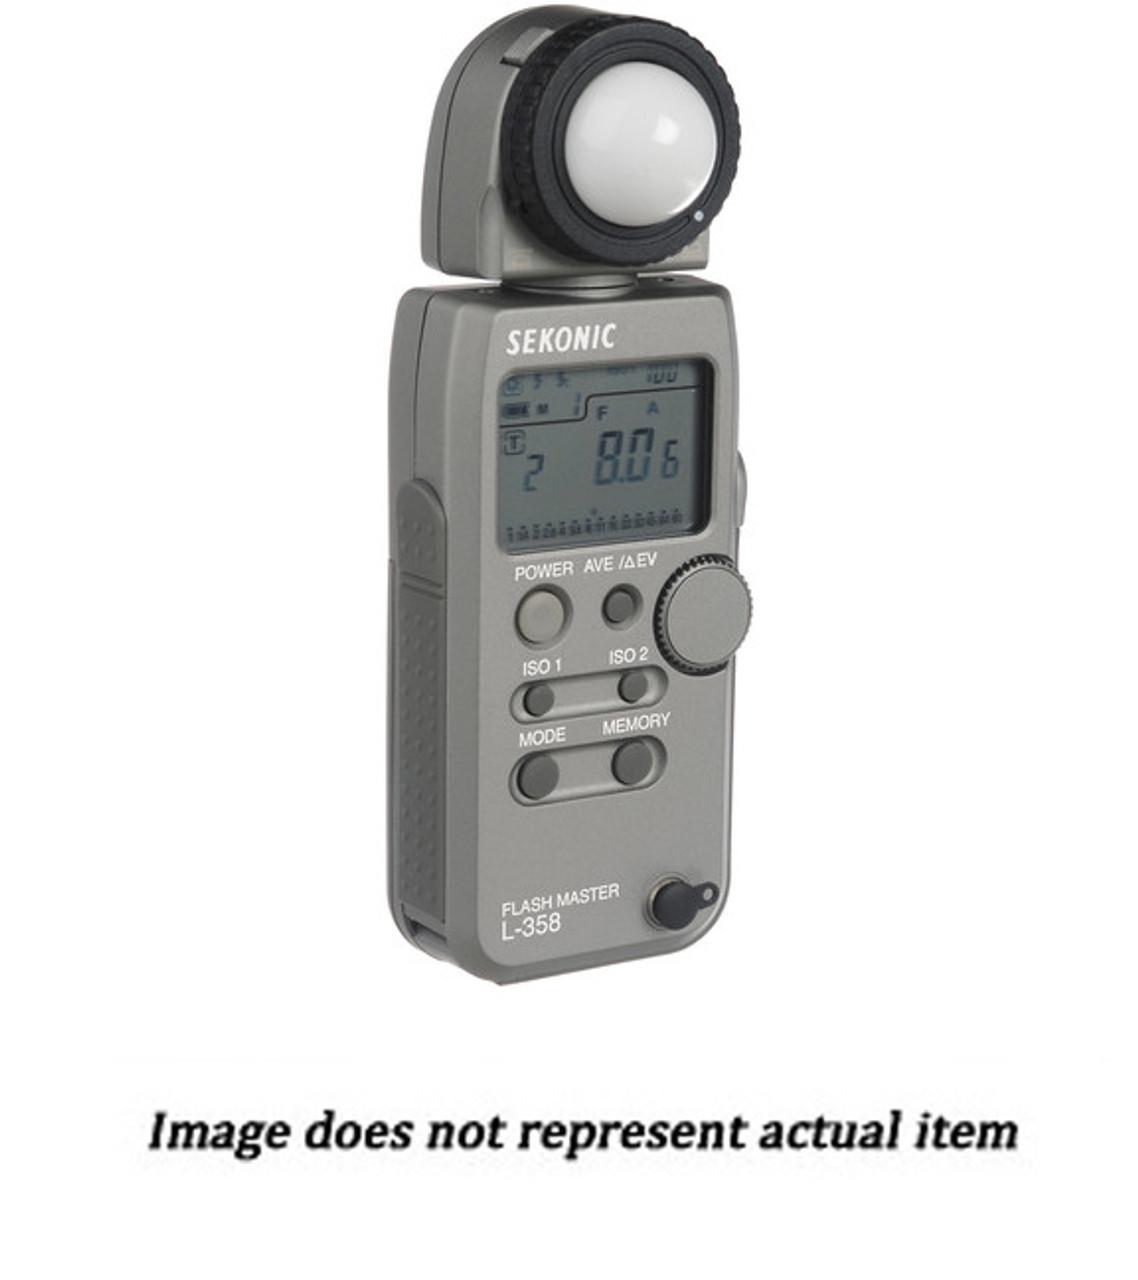 Sekonic Flash Master L-358 (USED) - S/N 401358